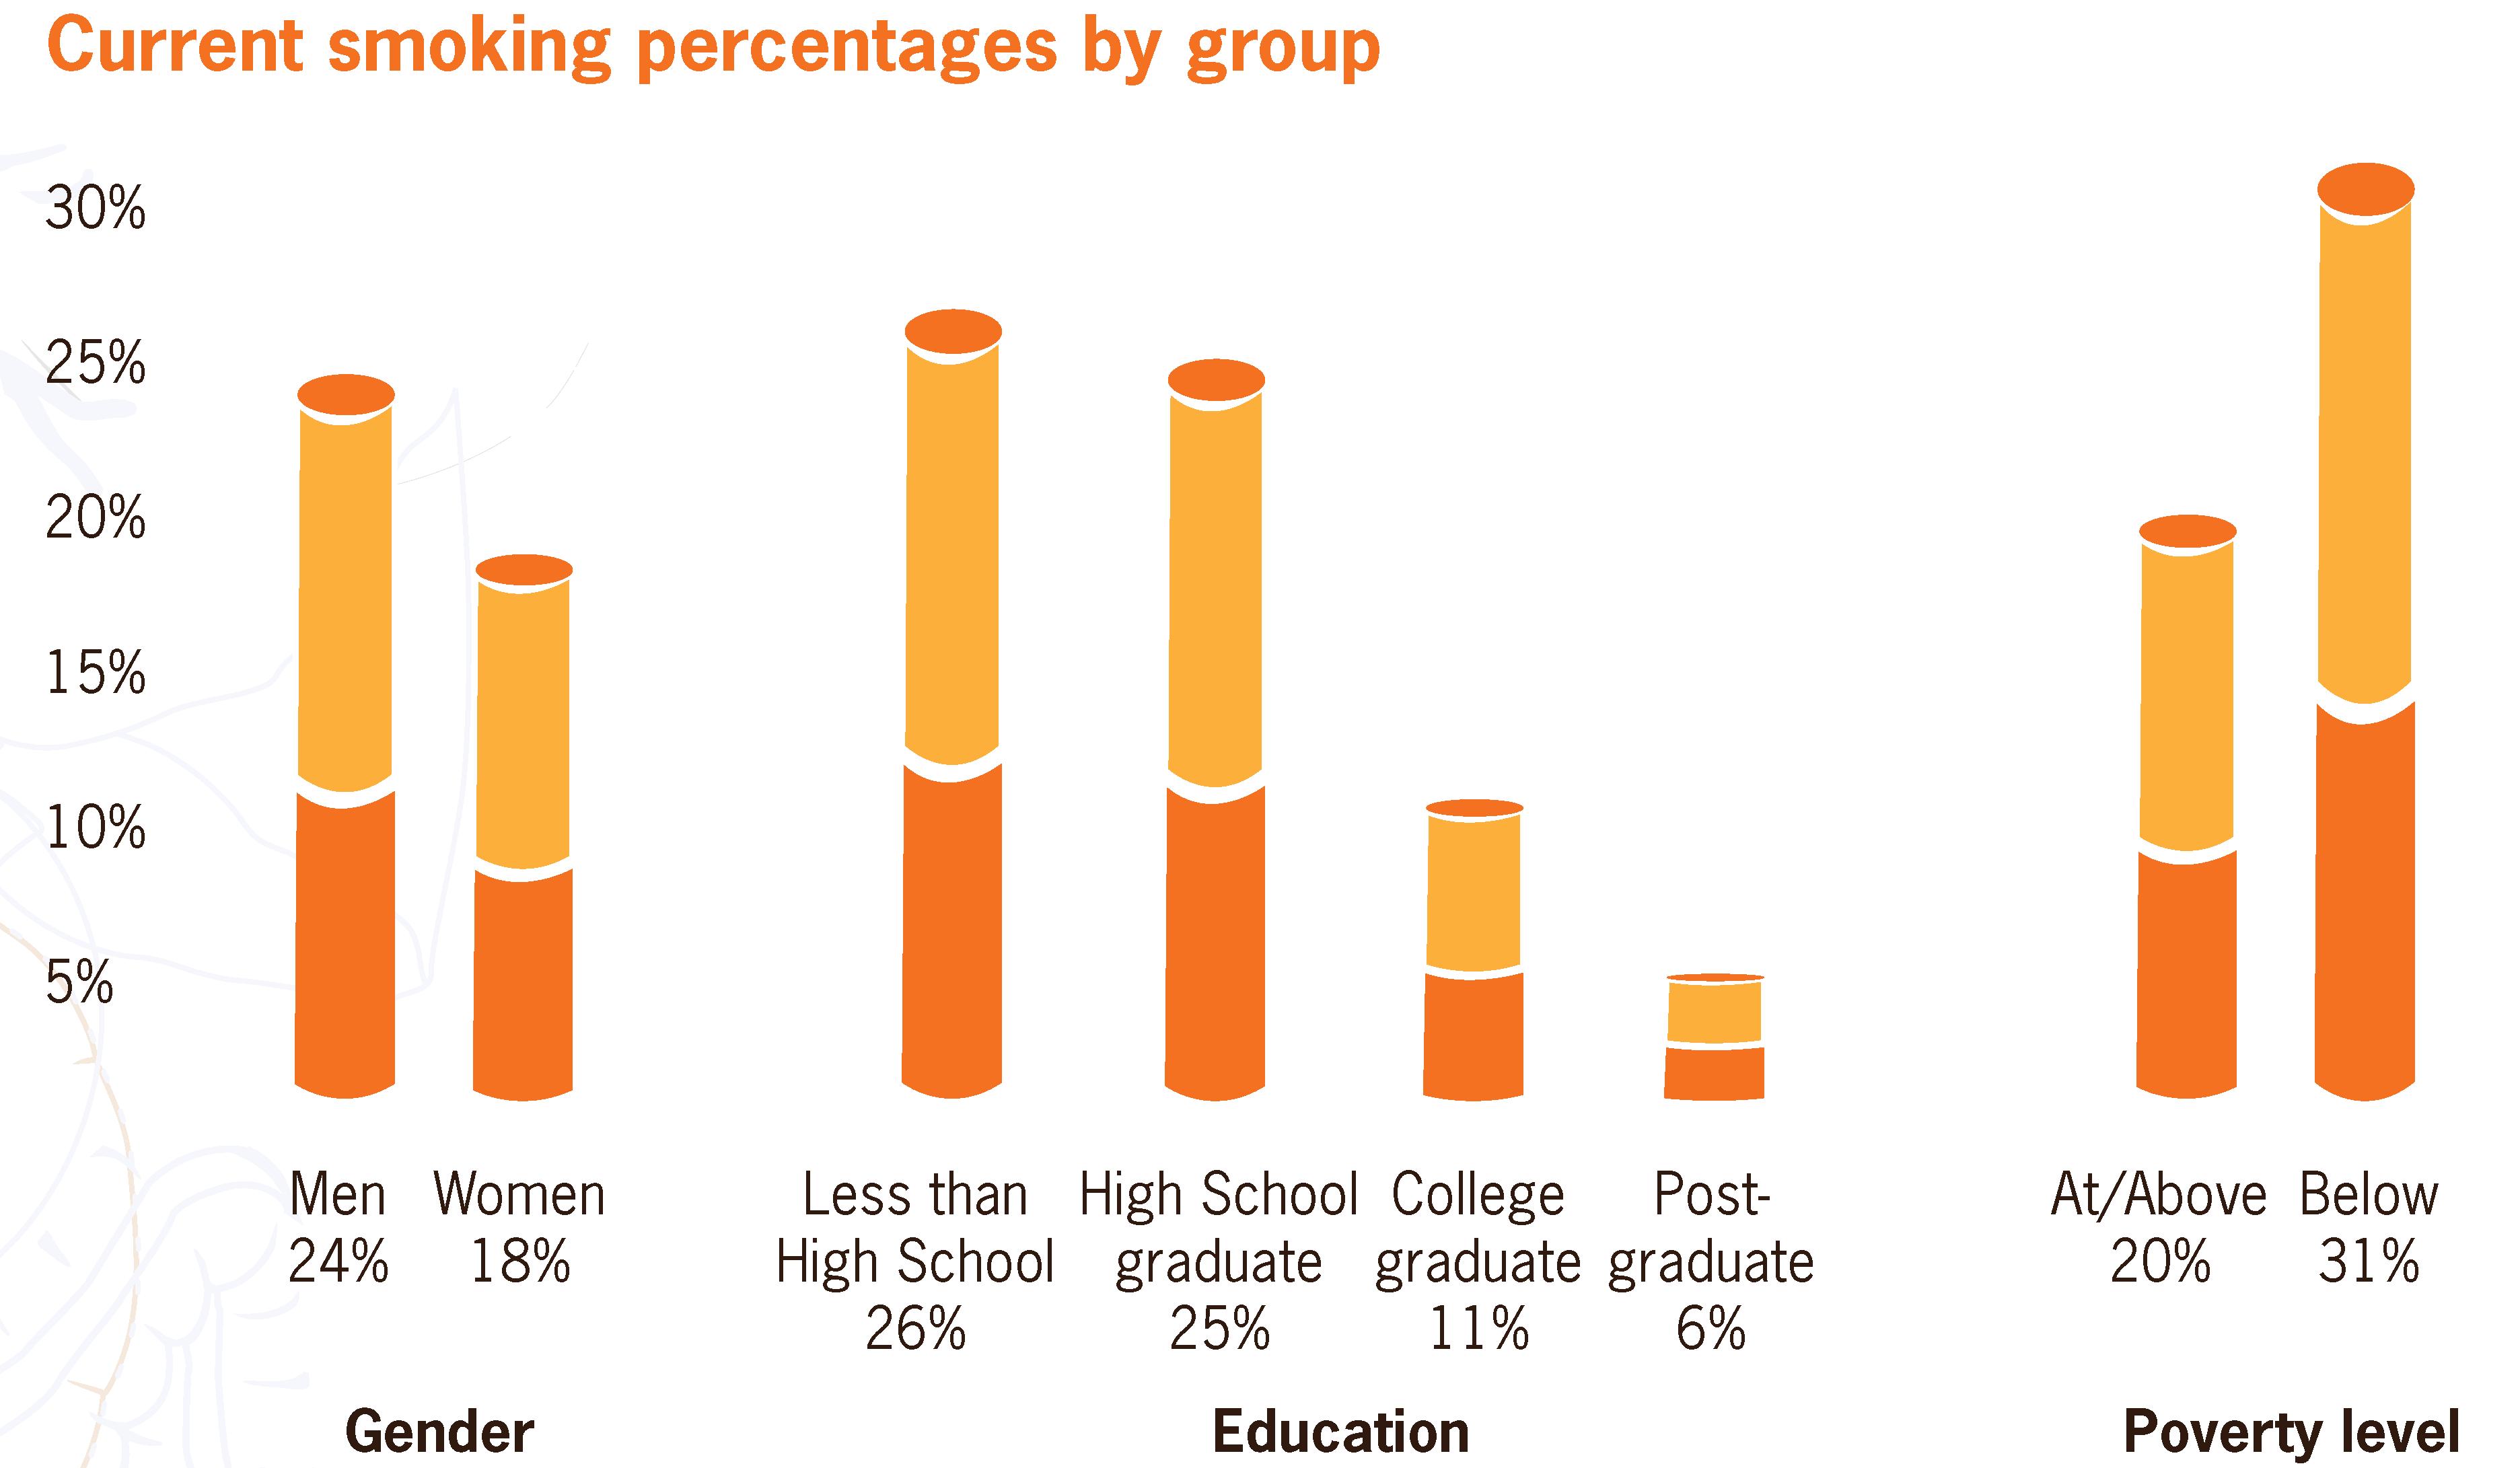 Illinois ups its minimum smoking age from 18 to 21